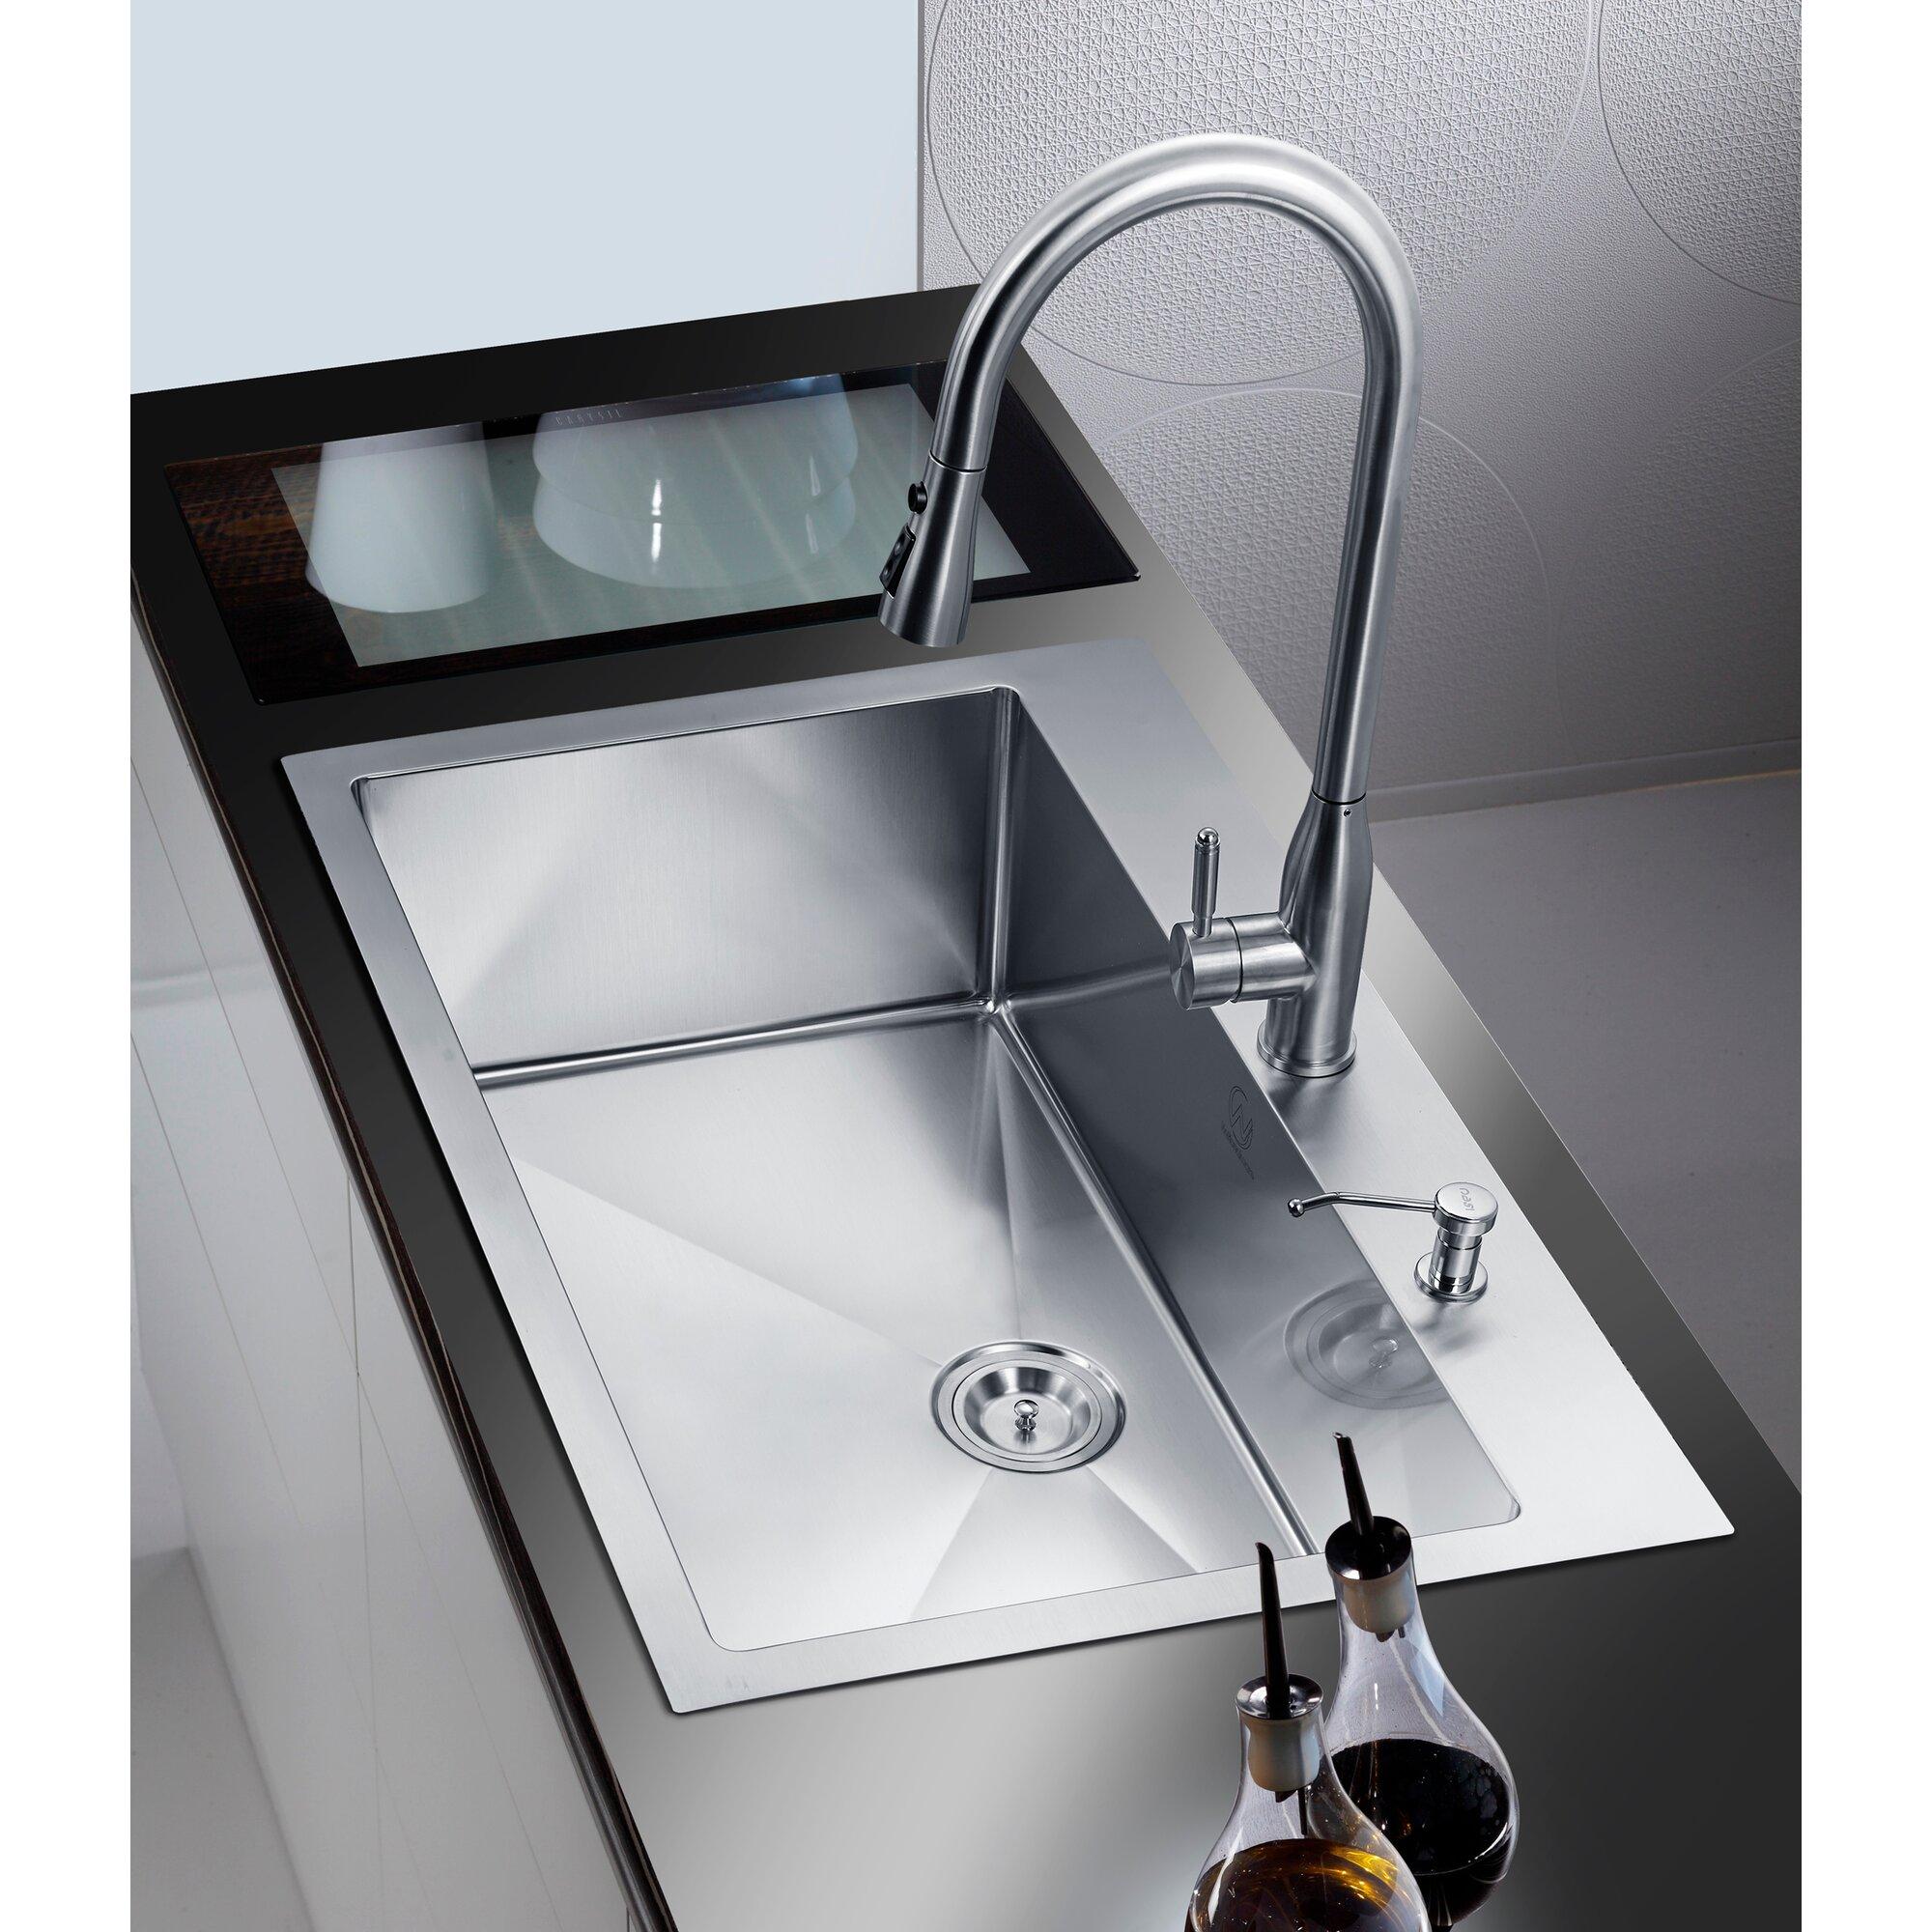 33 x 22 single drop in kitchen sink - Kitchen Sink Drop In